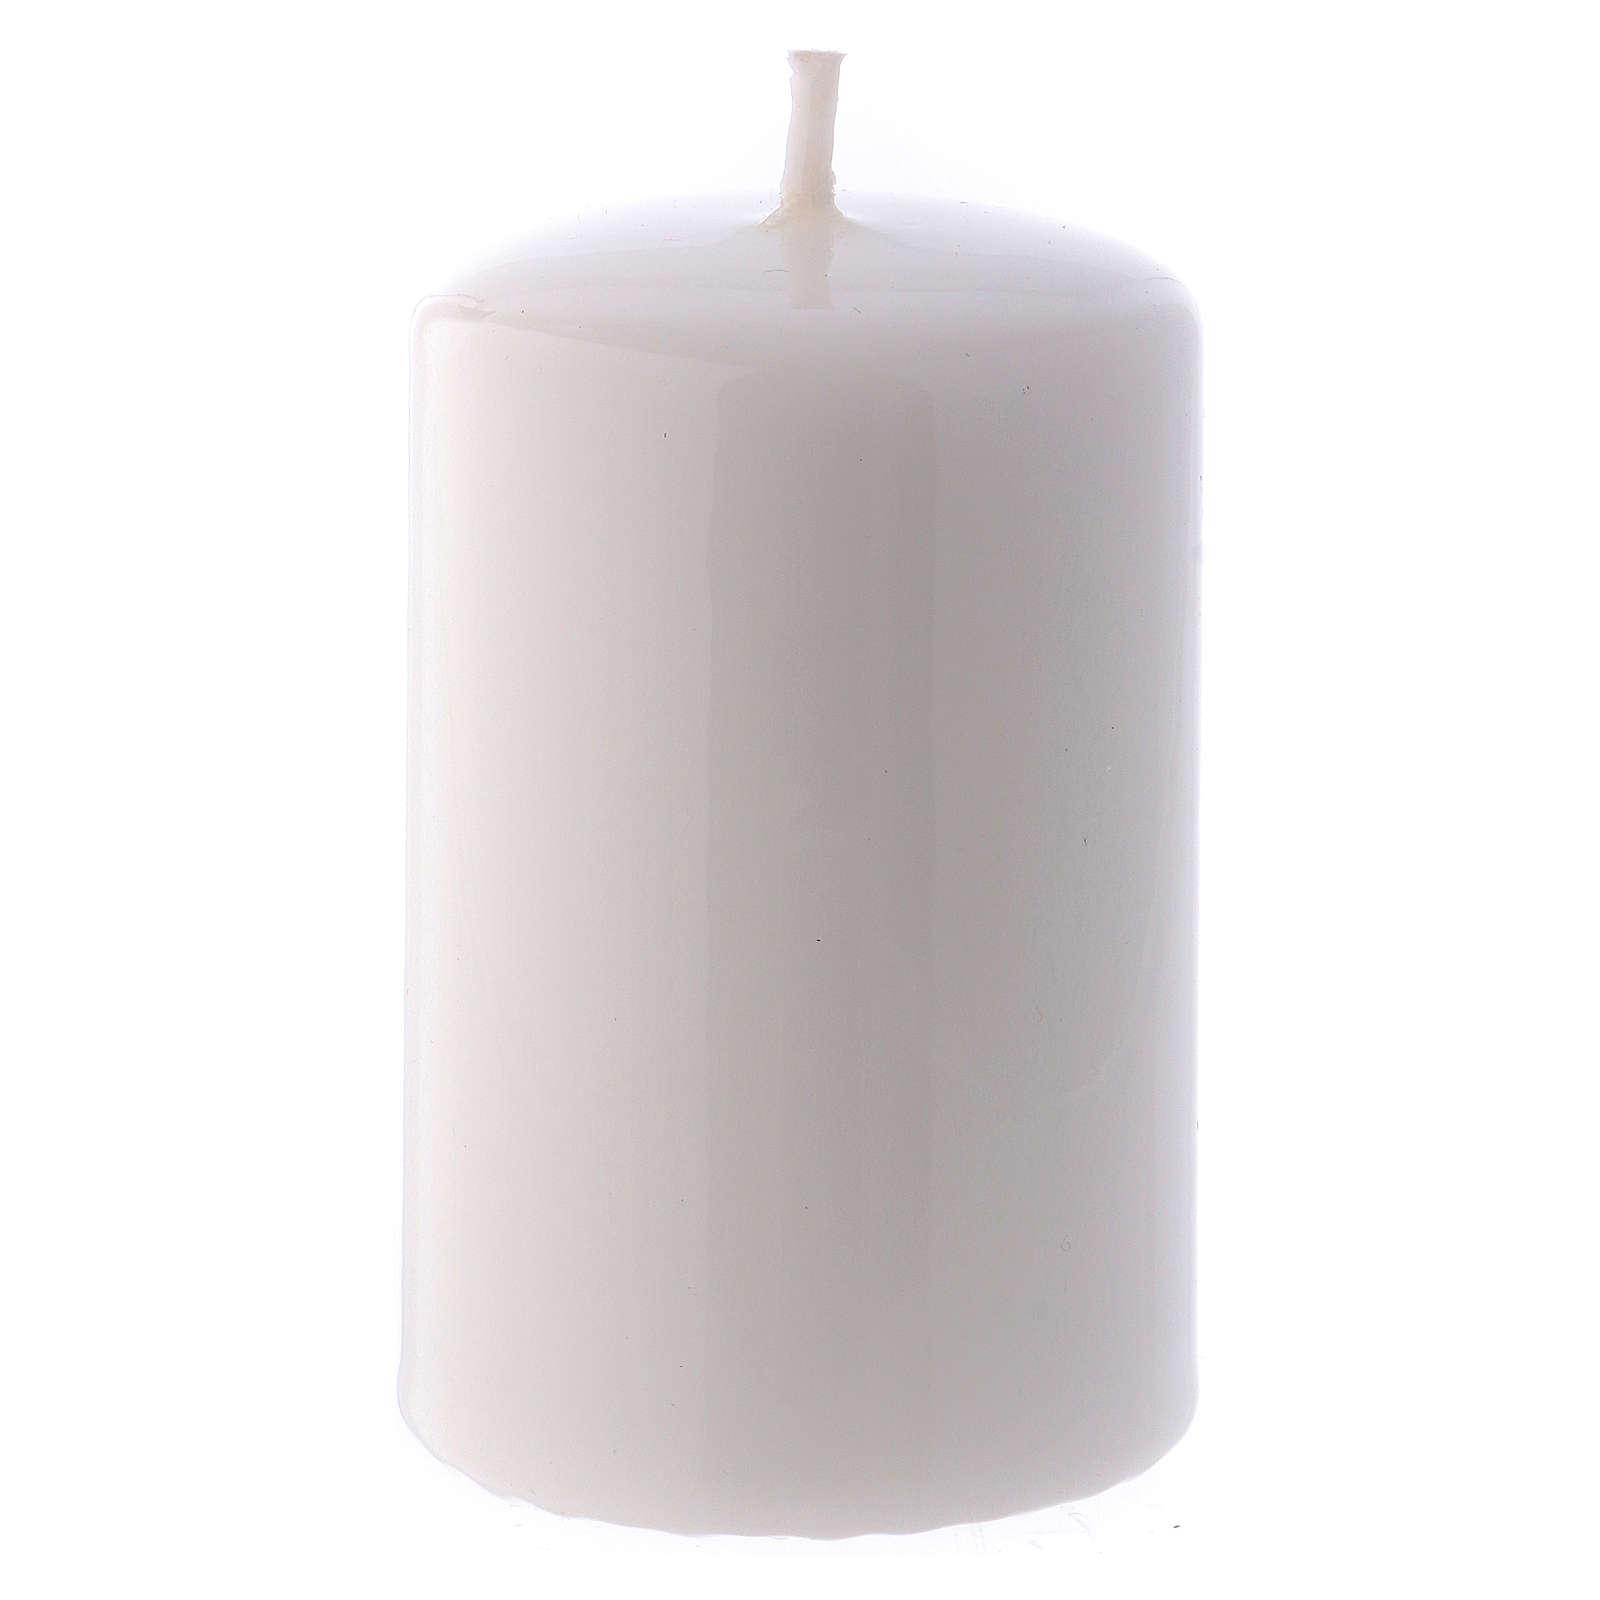 Bougie Brillante Ceralacca 5x8 cm blanc 3